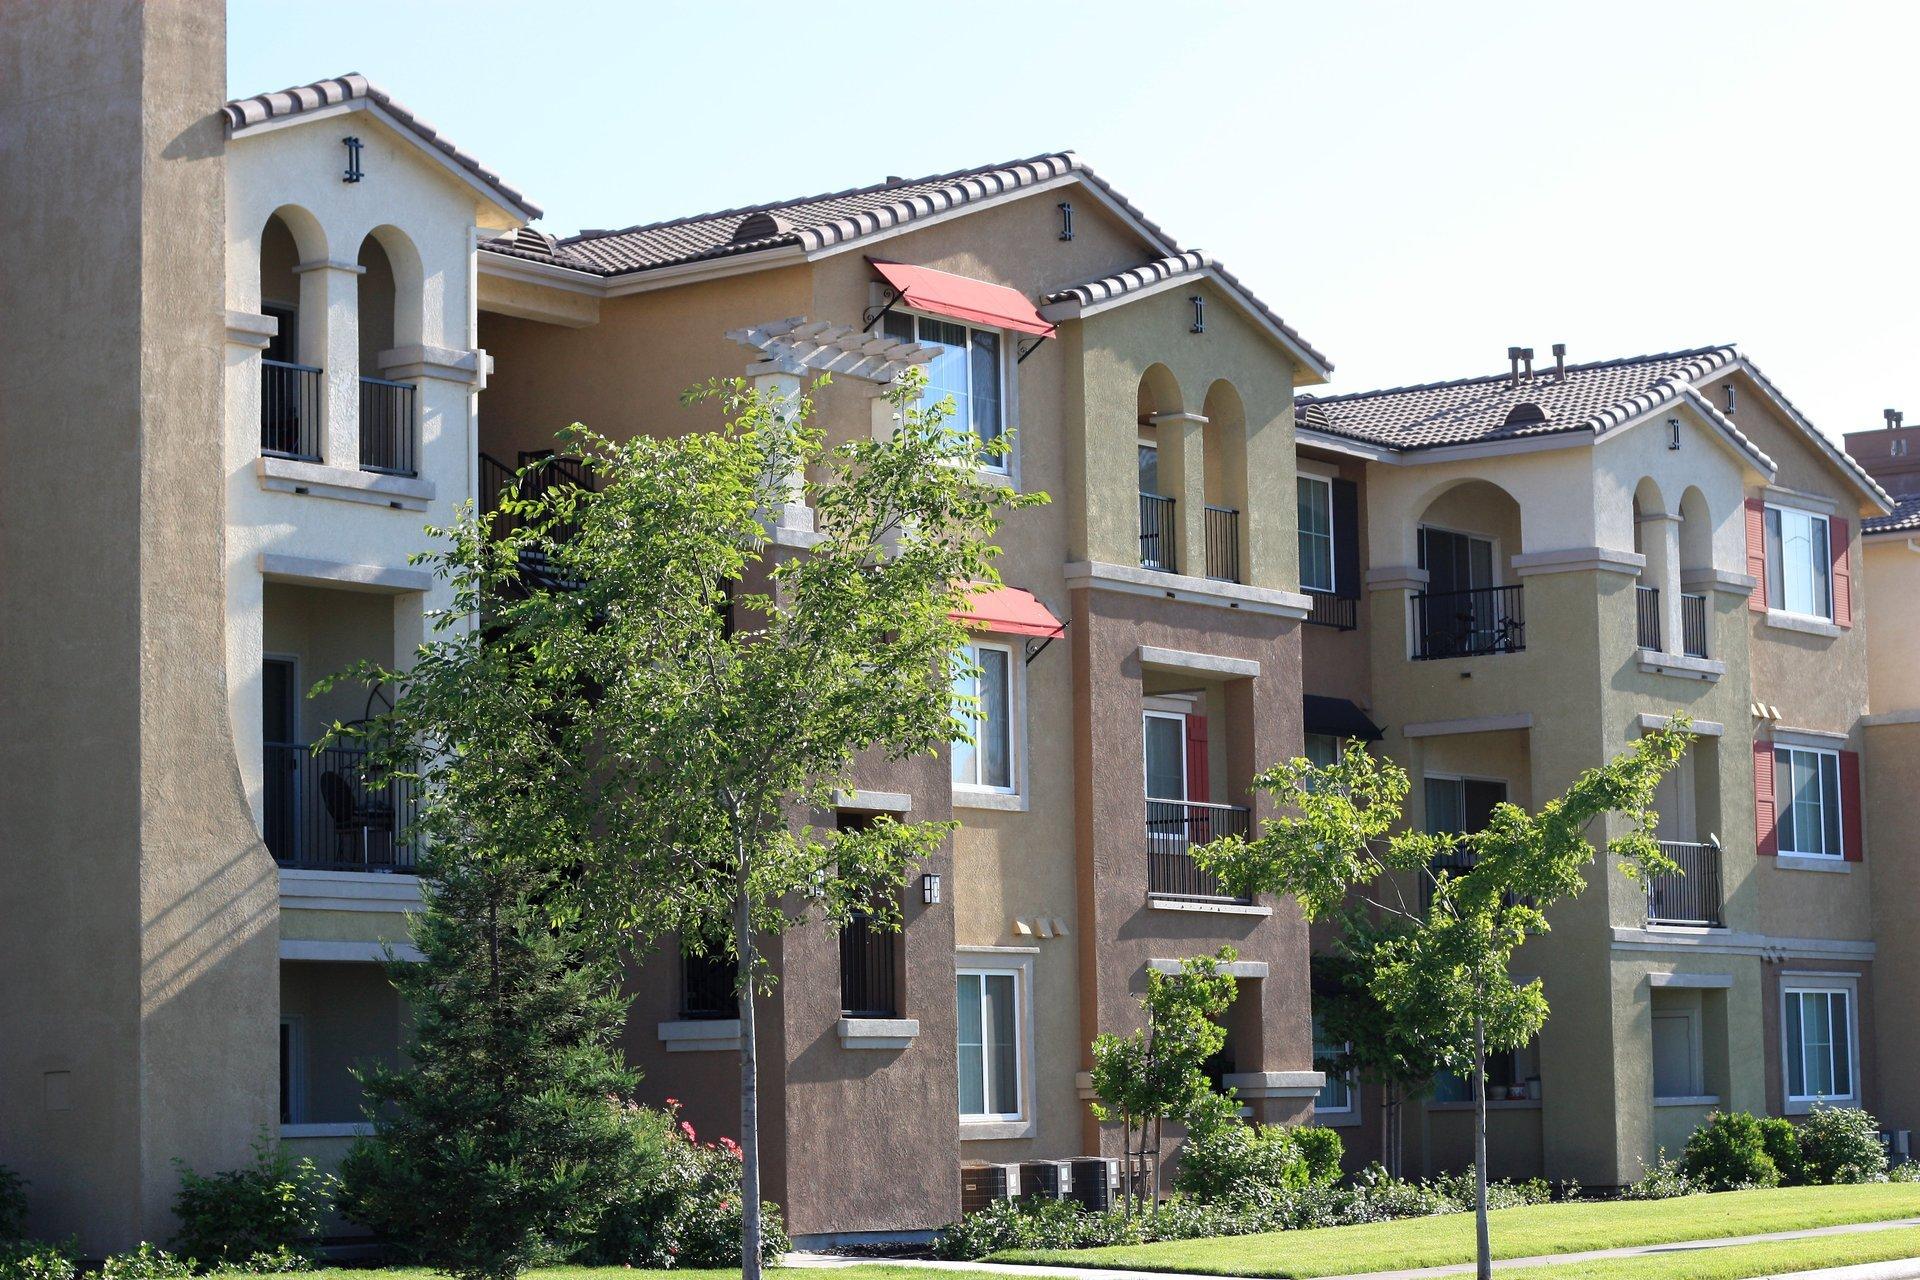 Landlord Services Of Upstate New York Inc Ballston Lake